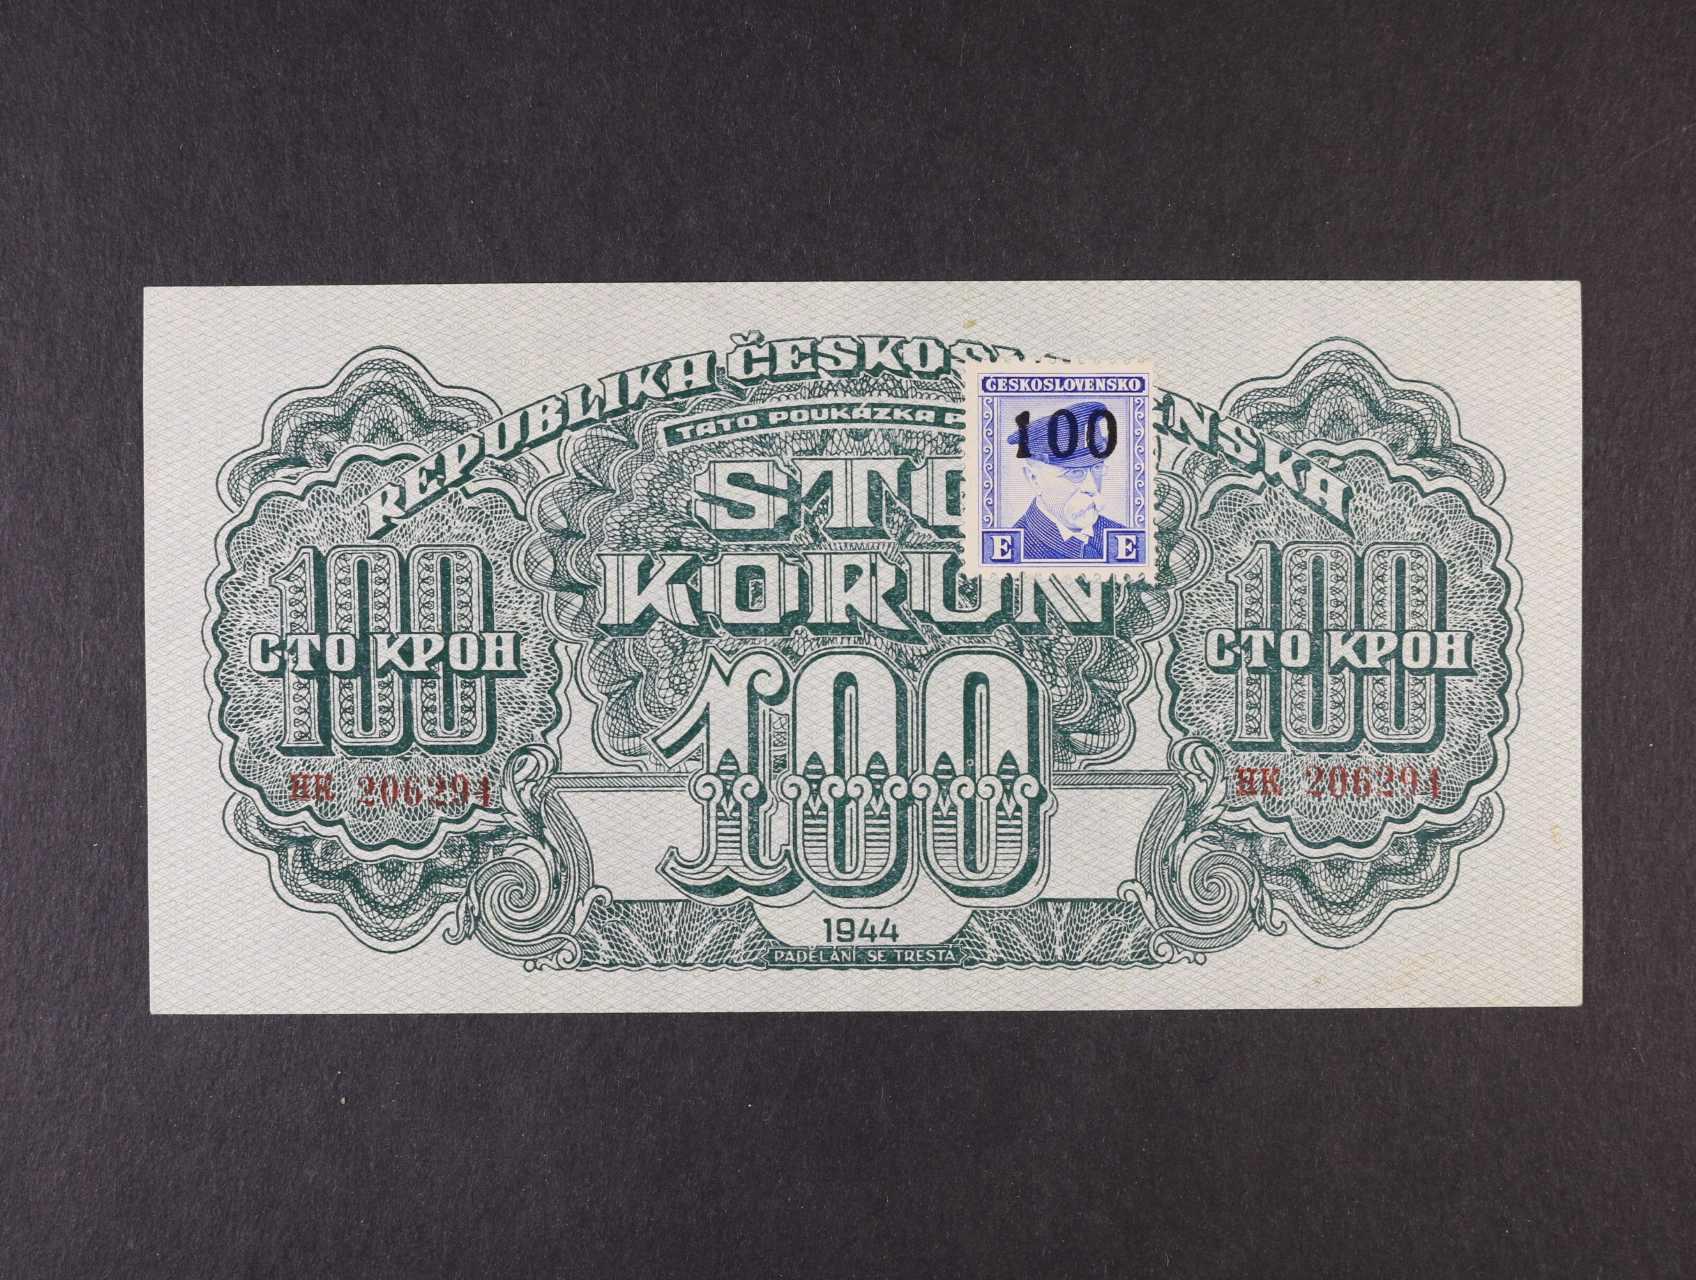 100 K 1944 série HK kolkovaná, číslovač 8, Ba. 66b, Pi. 53a